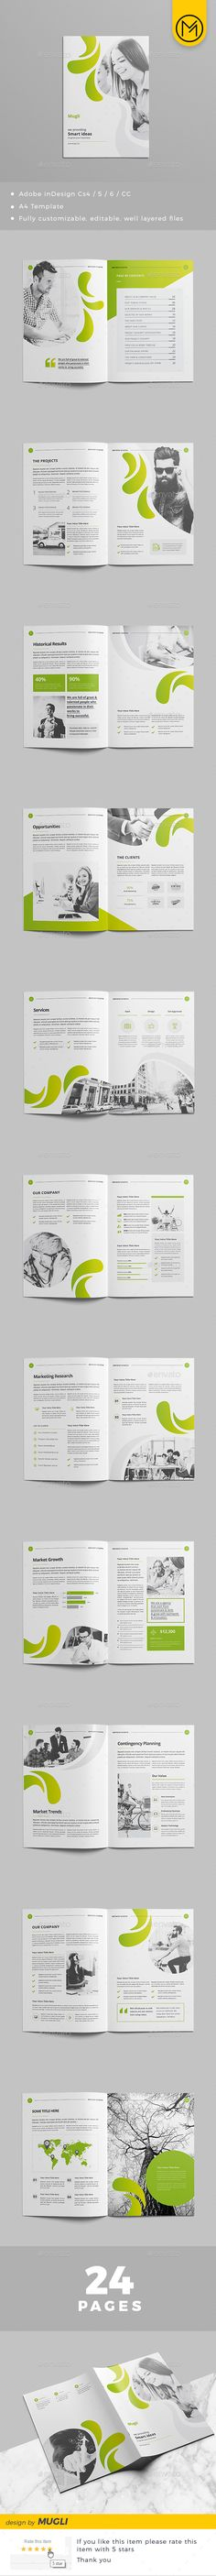 Brochure Design 2018 #corporate #a4 • Download ➝ https://graphicriver.net/item/brochure-design-2018/21355396?ref=pxcr